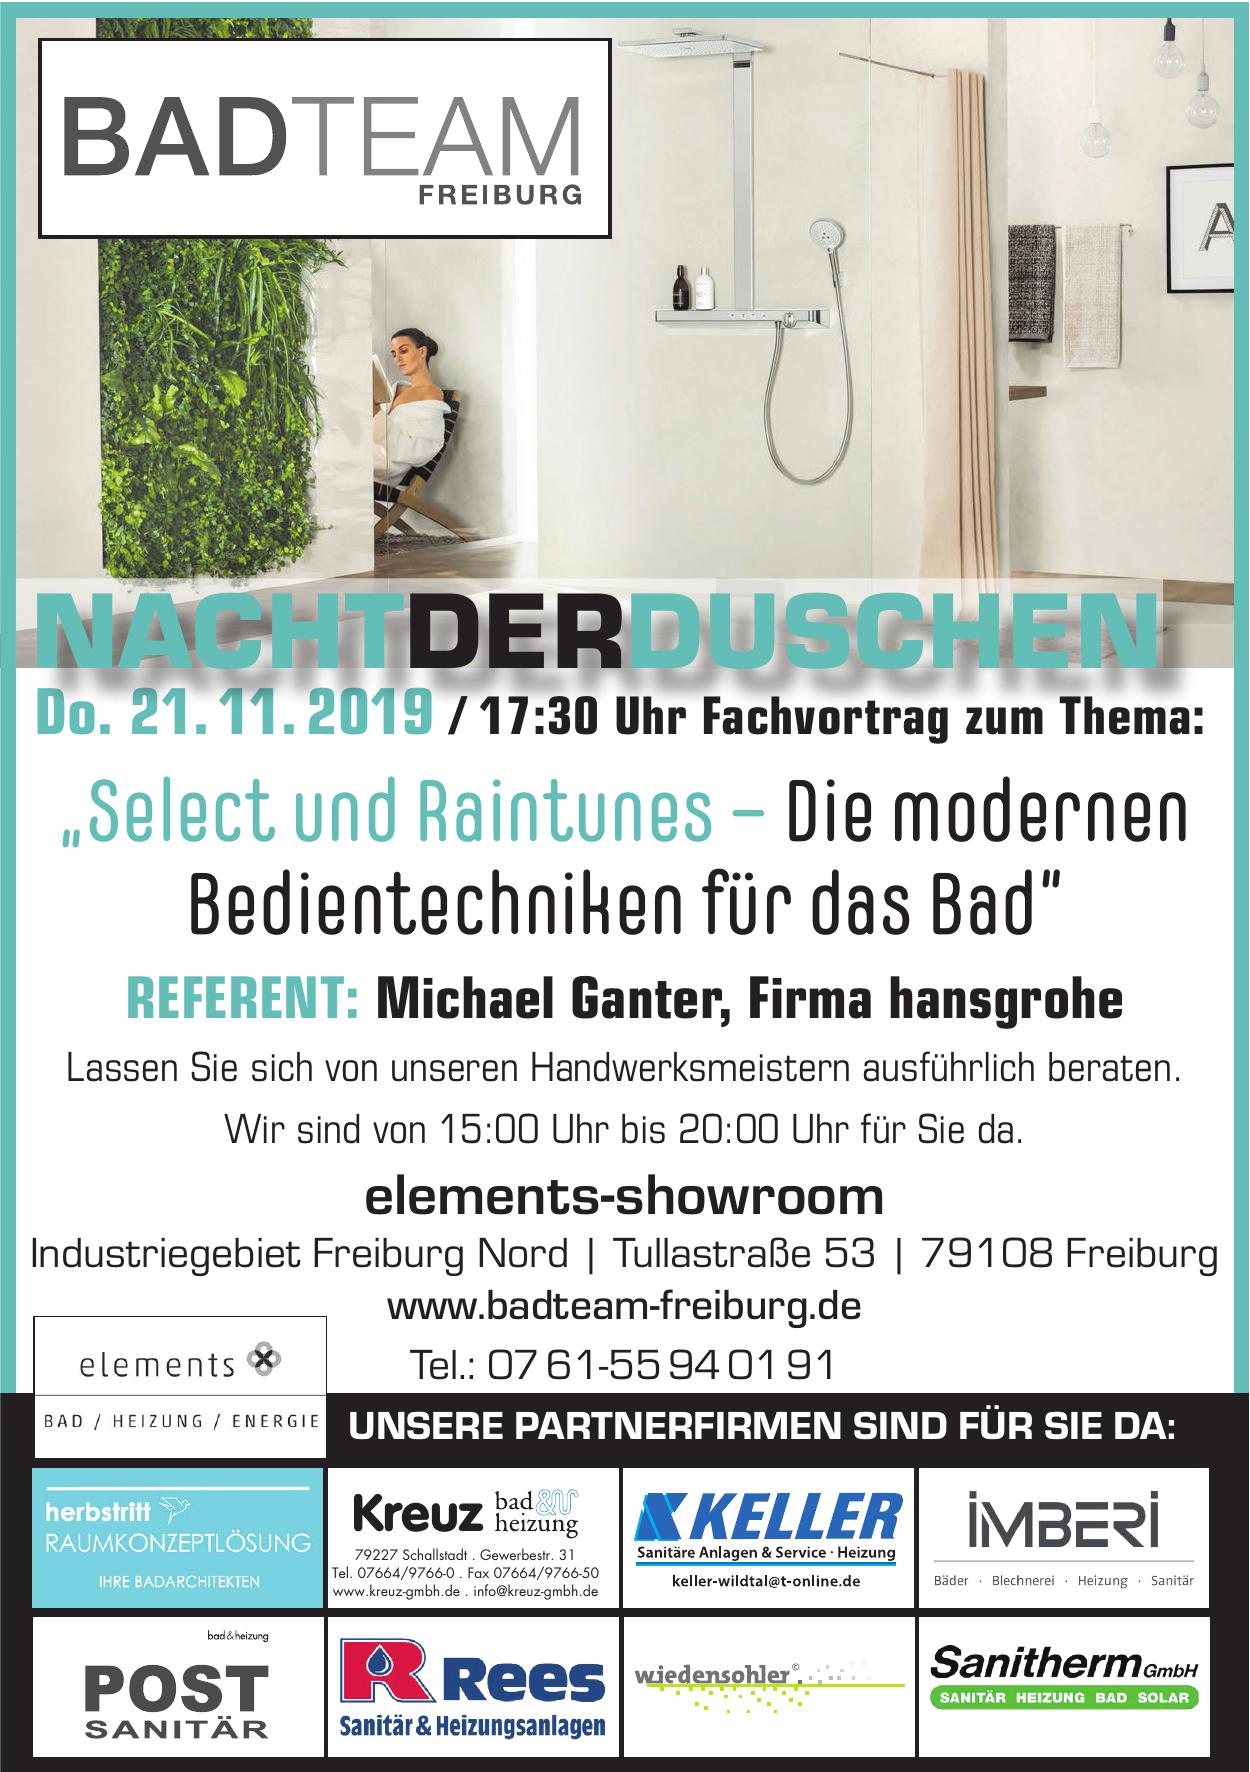 Badteam Freiburg